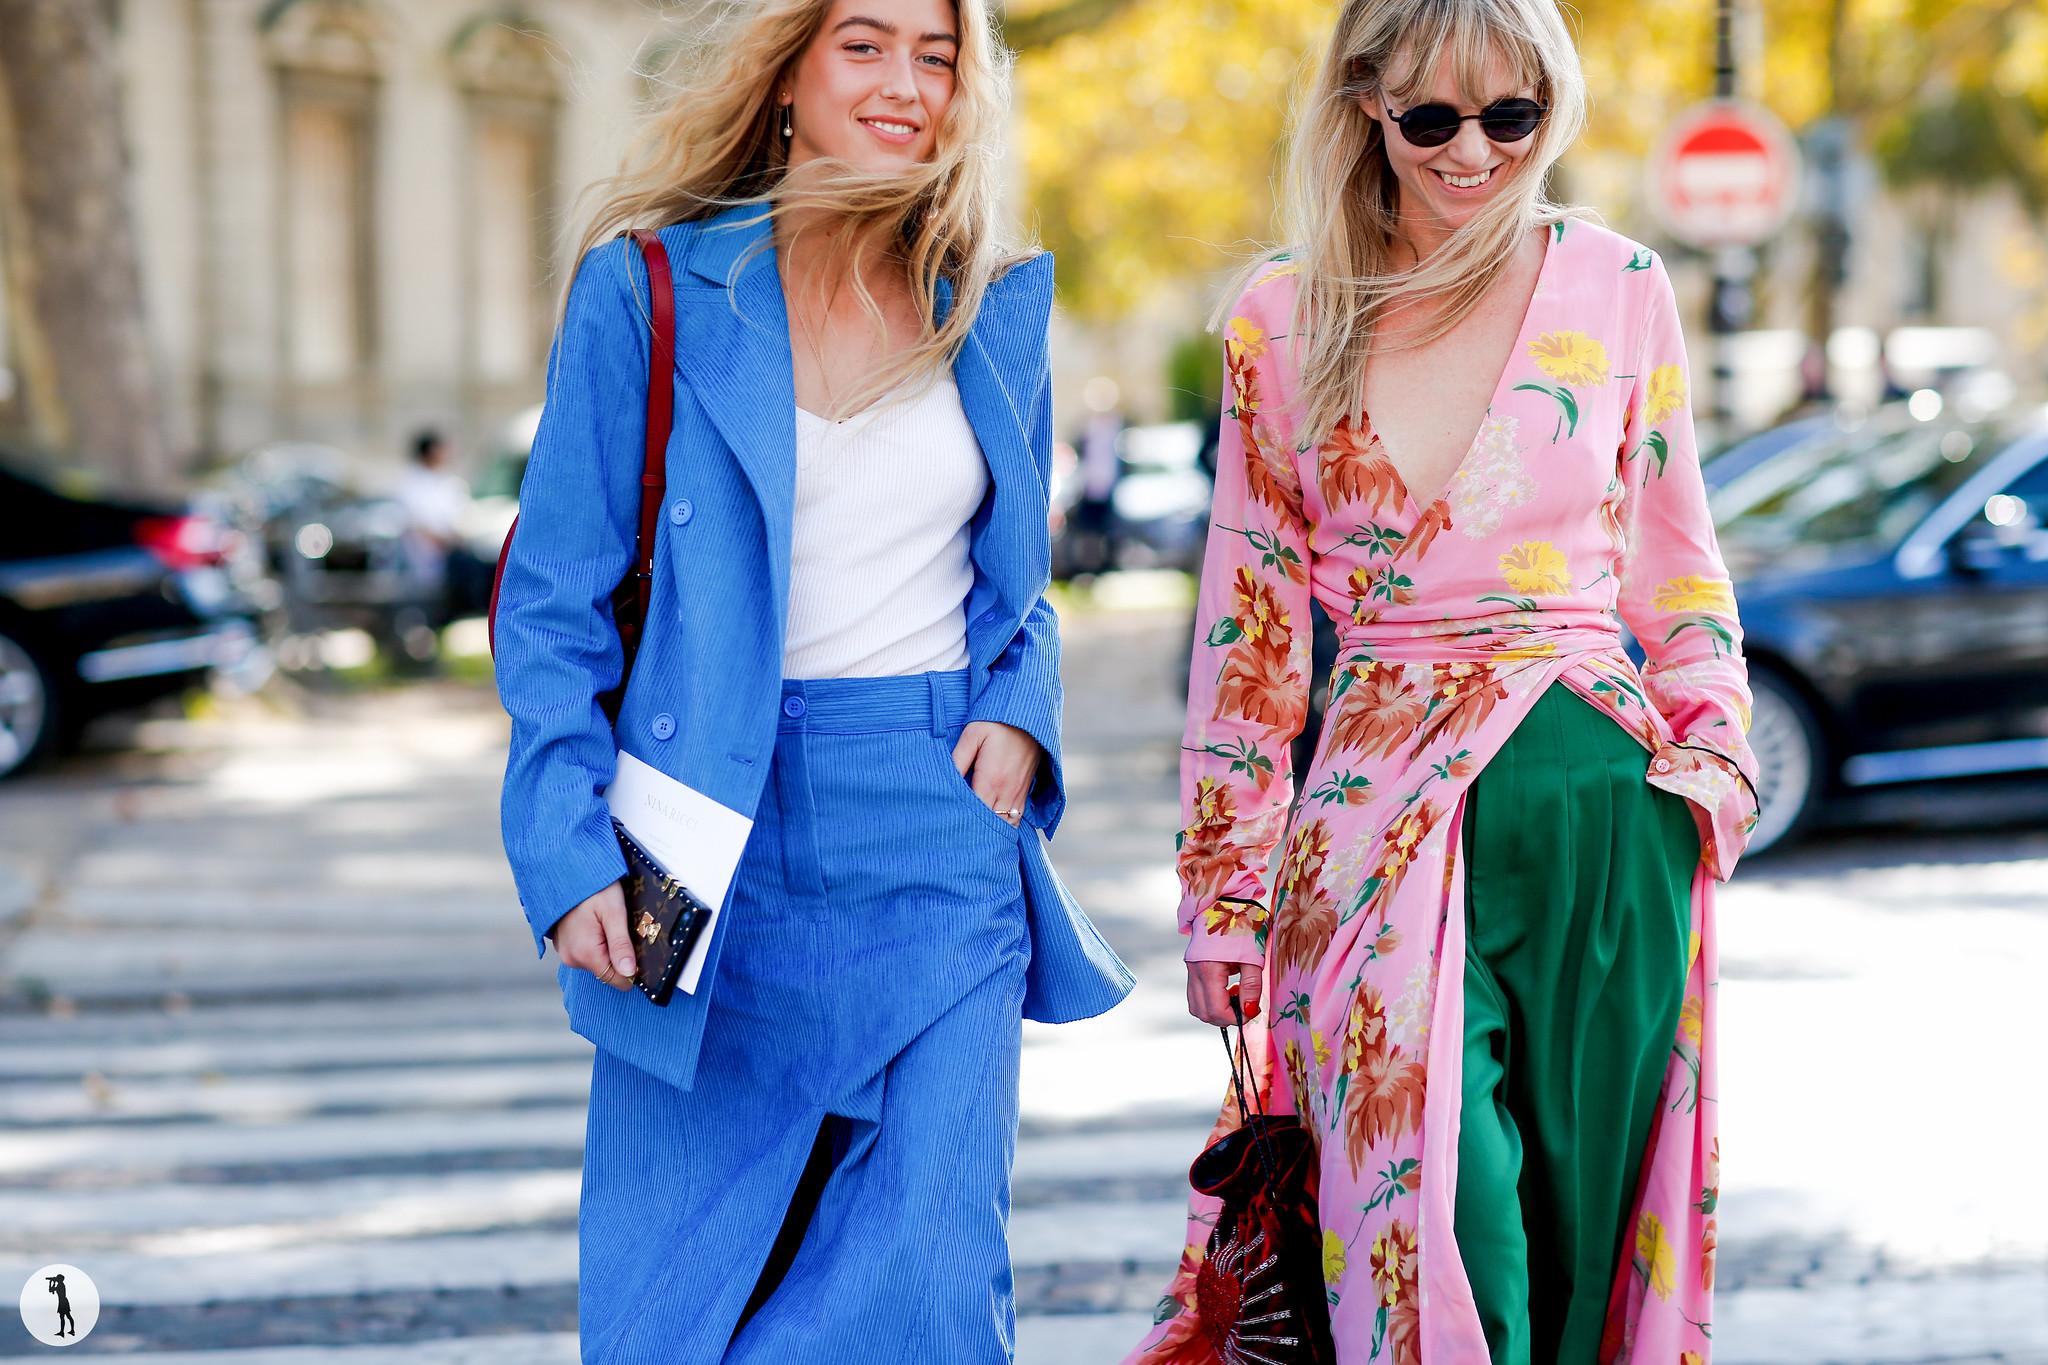 Emili Sindlev and Jeanette Friis Madsen - Paris Fashion Week SS18 (2)